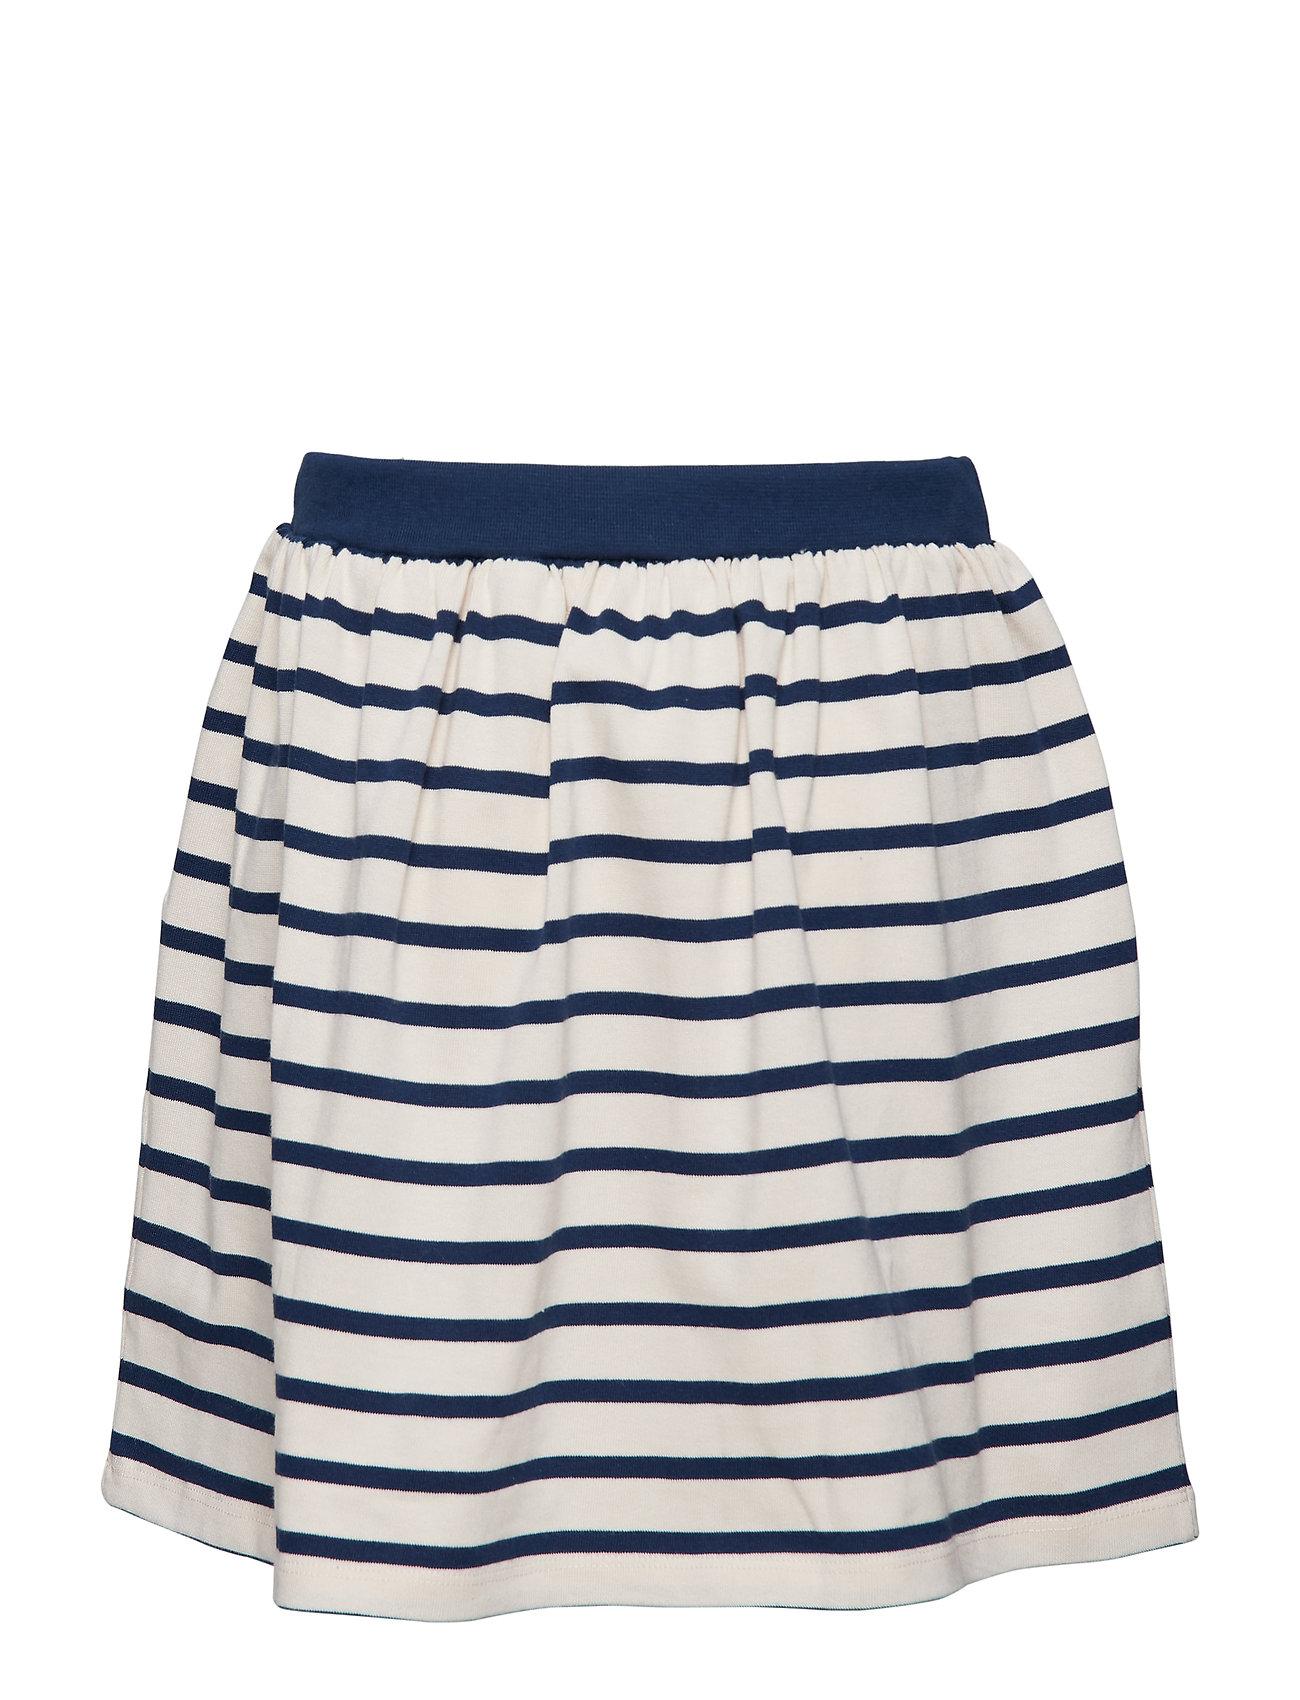 Skirt Nederdel Creme NOA NOA MINIATURE